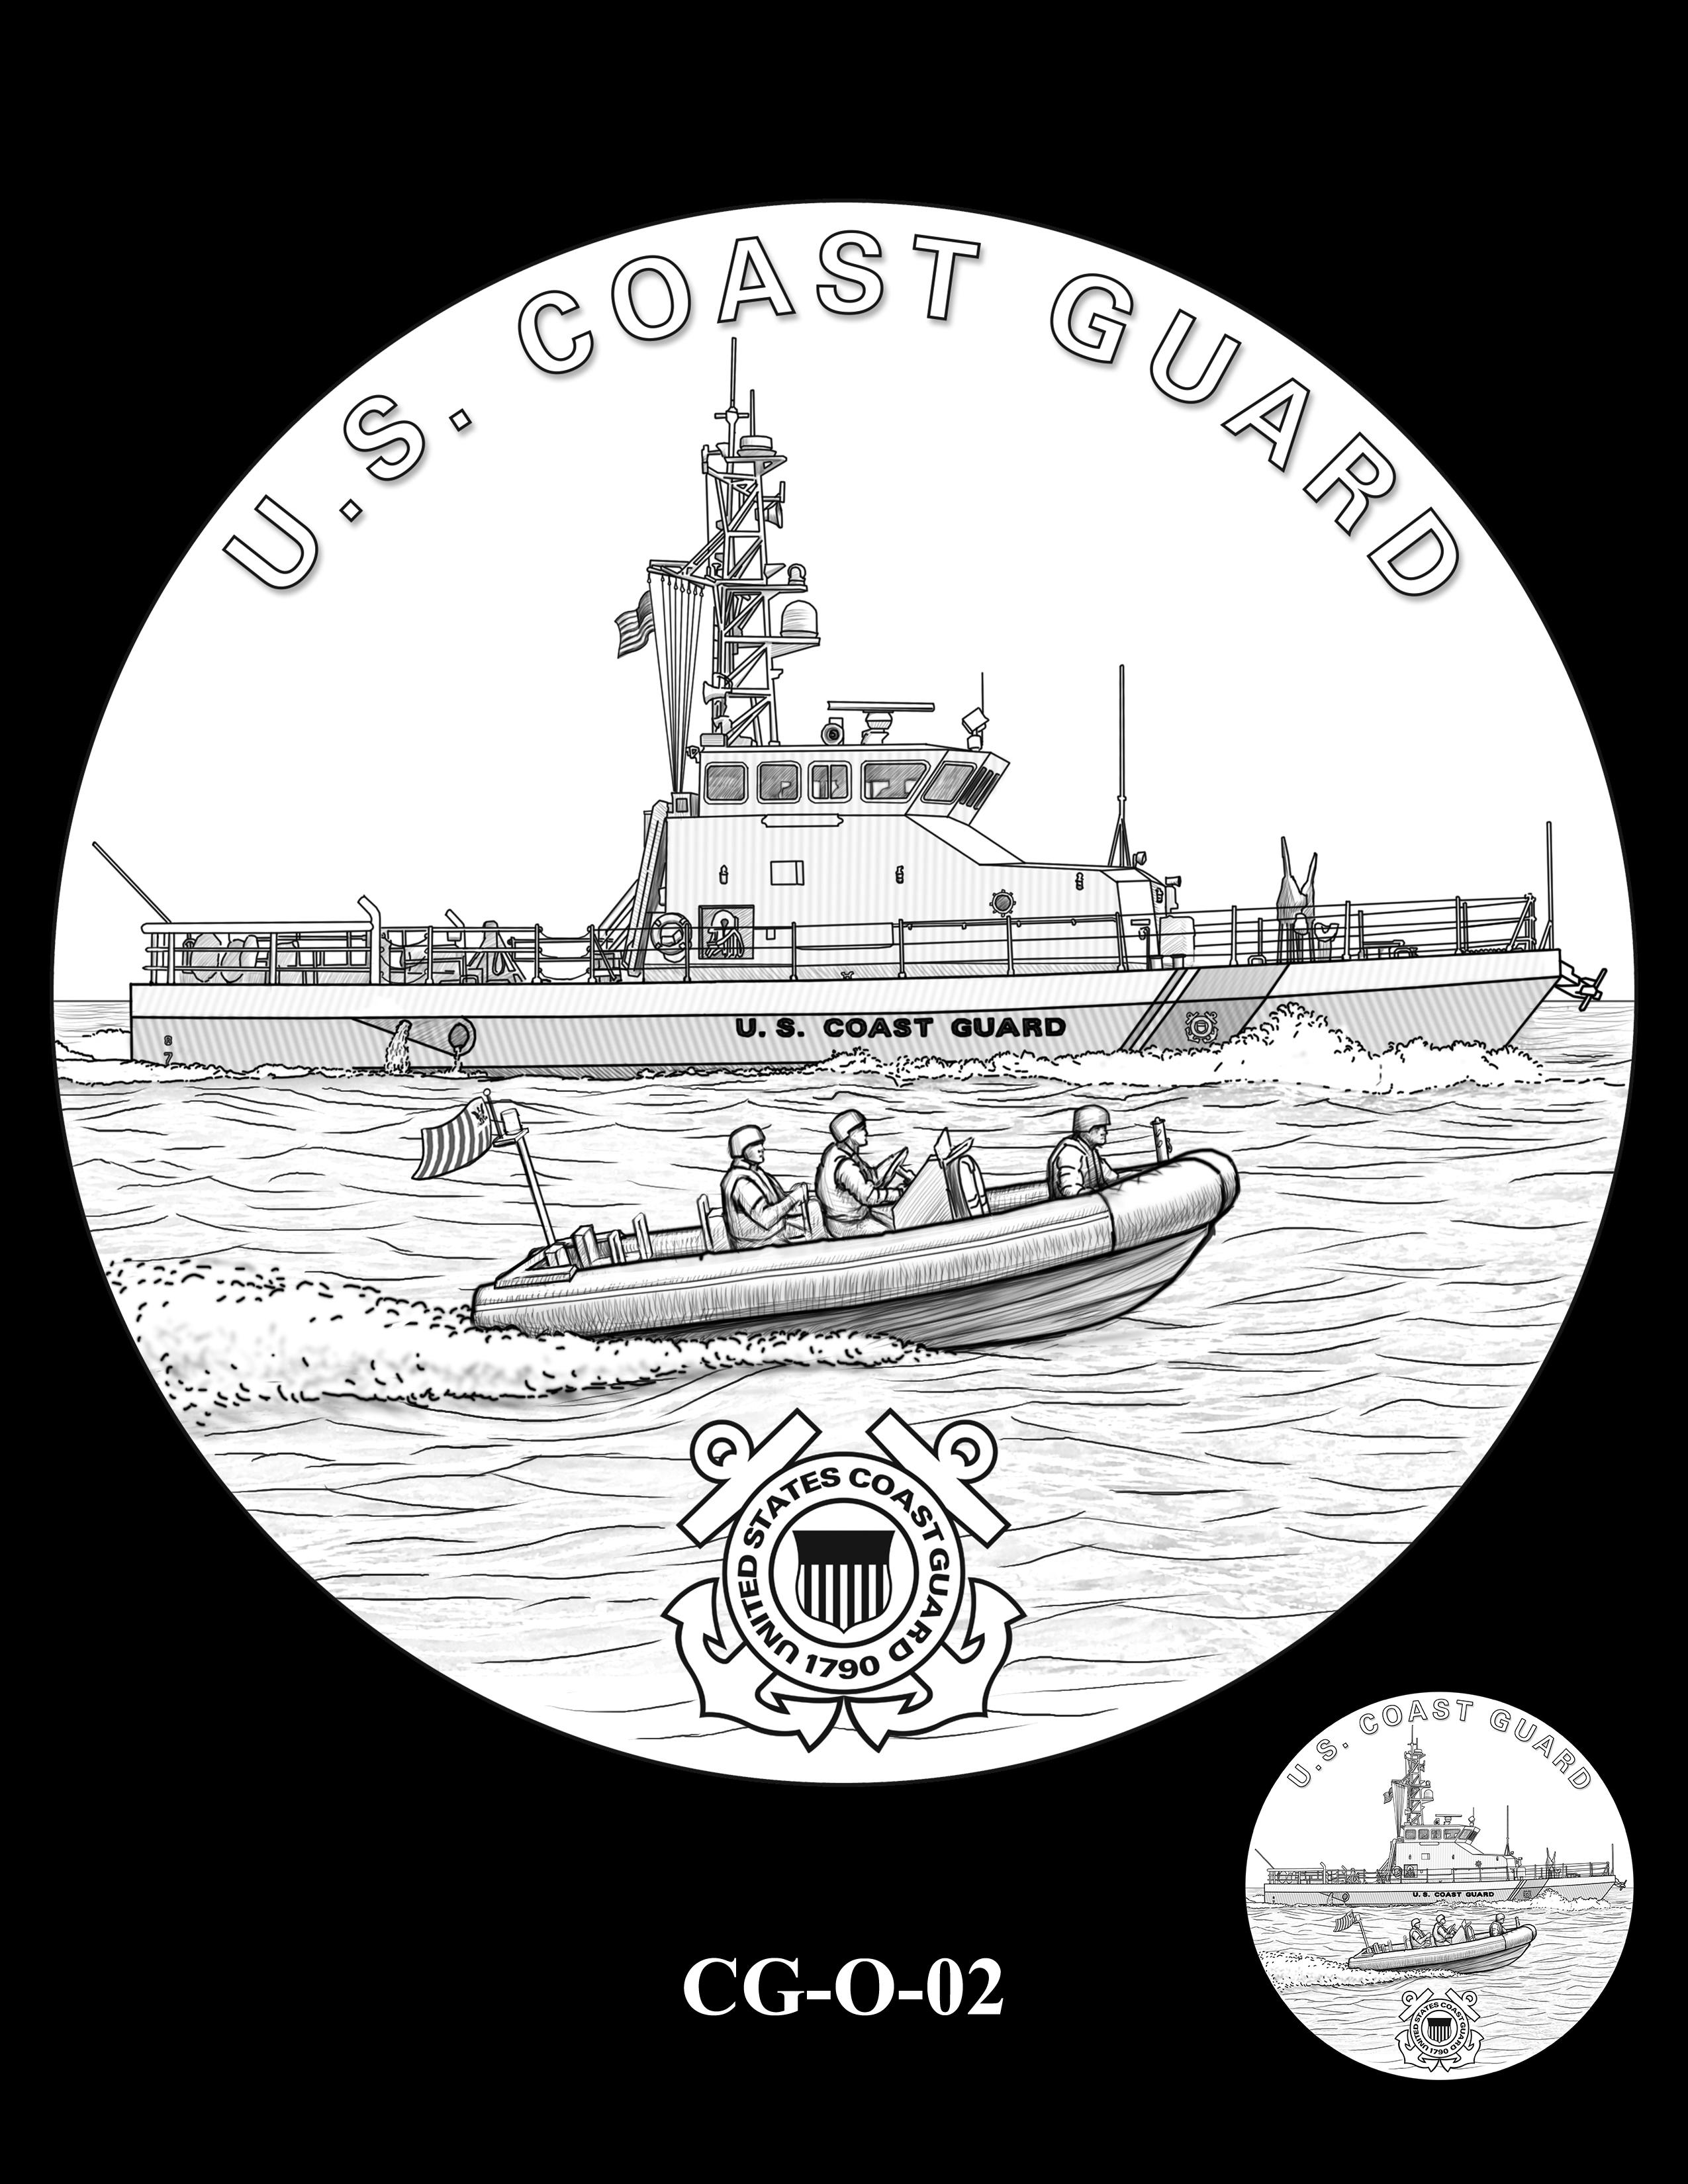 CG-O-02 -- Armed Forces Medal - Coast Guard